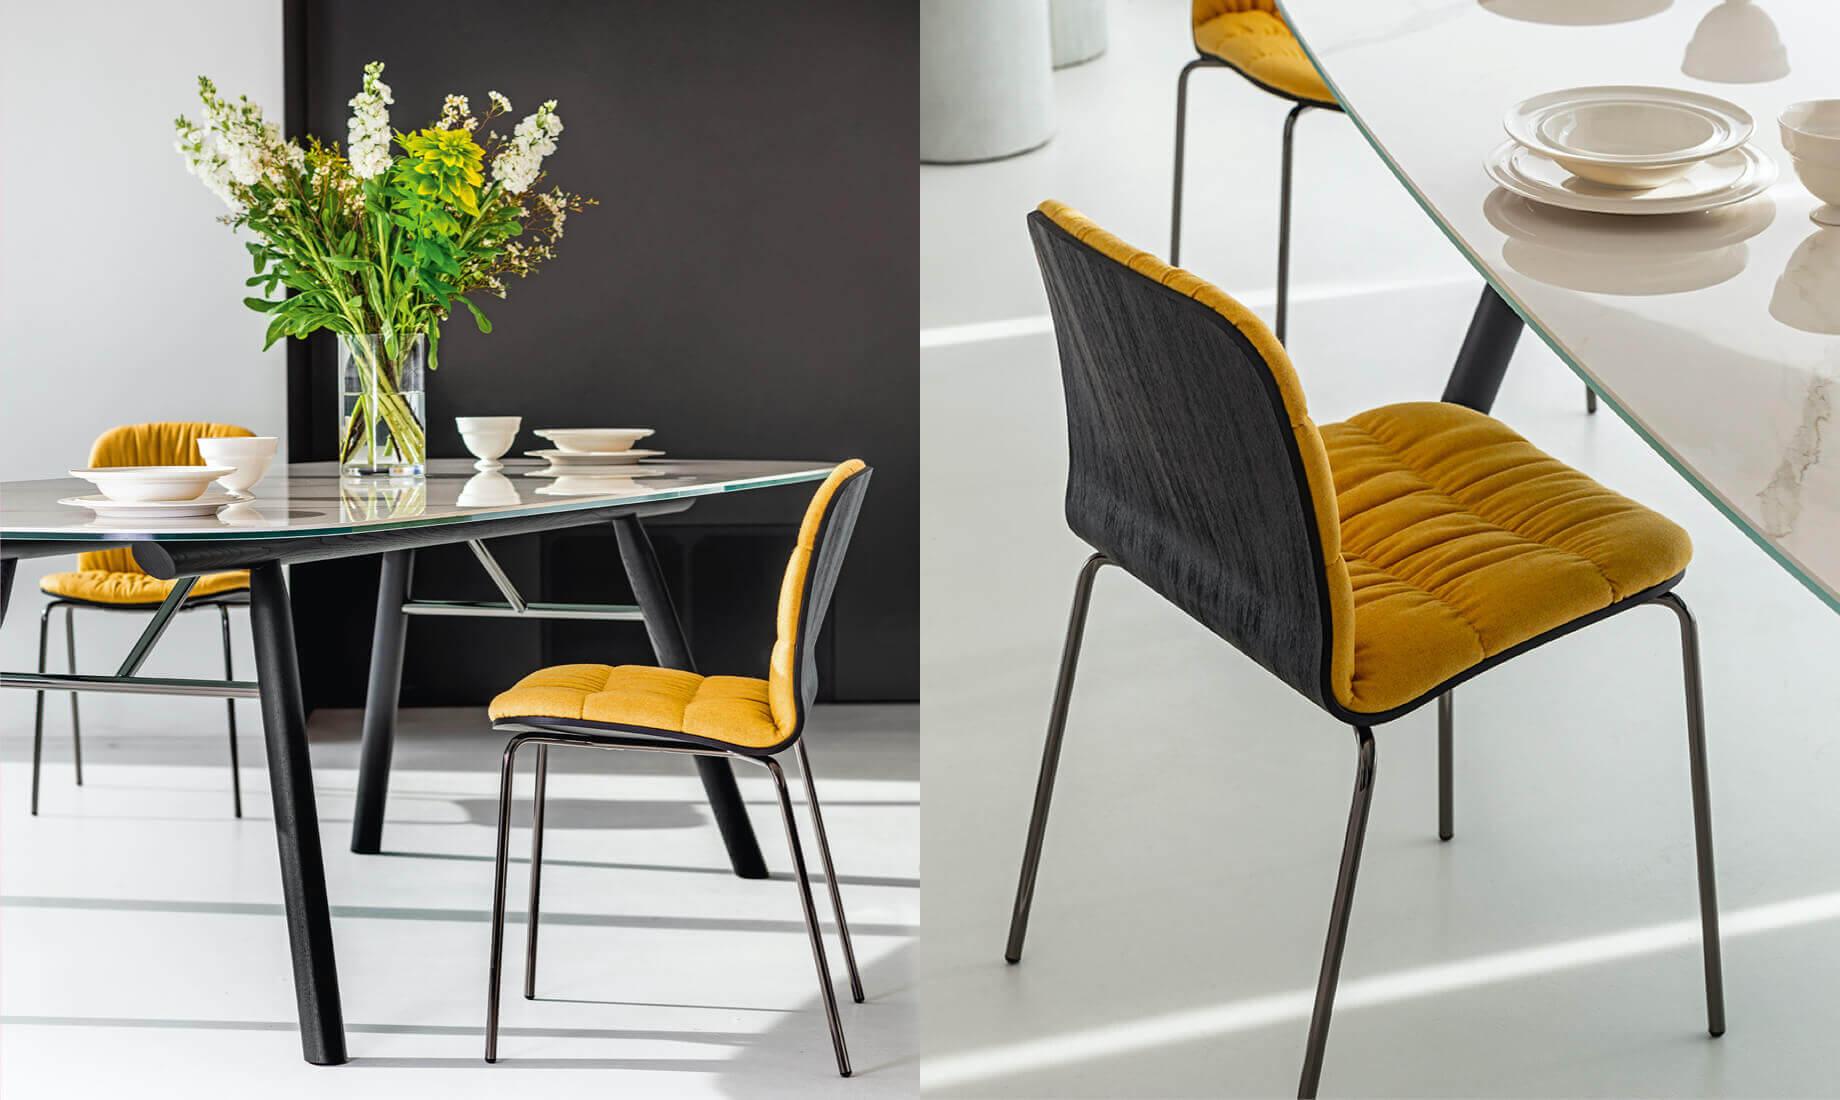 Midj - Pantone 2021 - Suite table